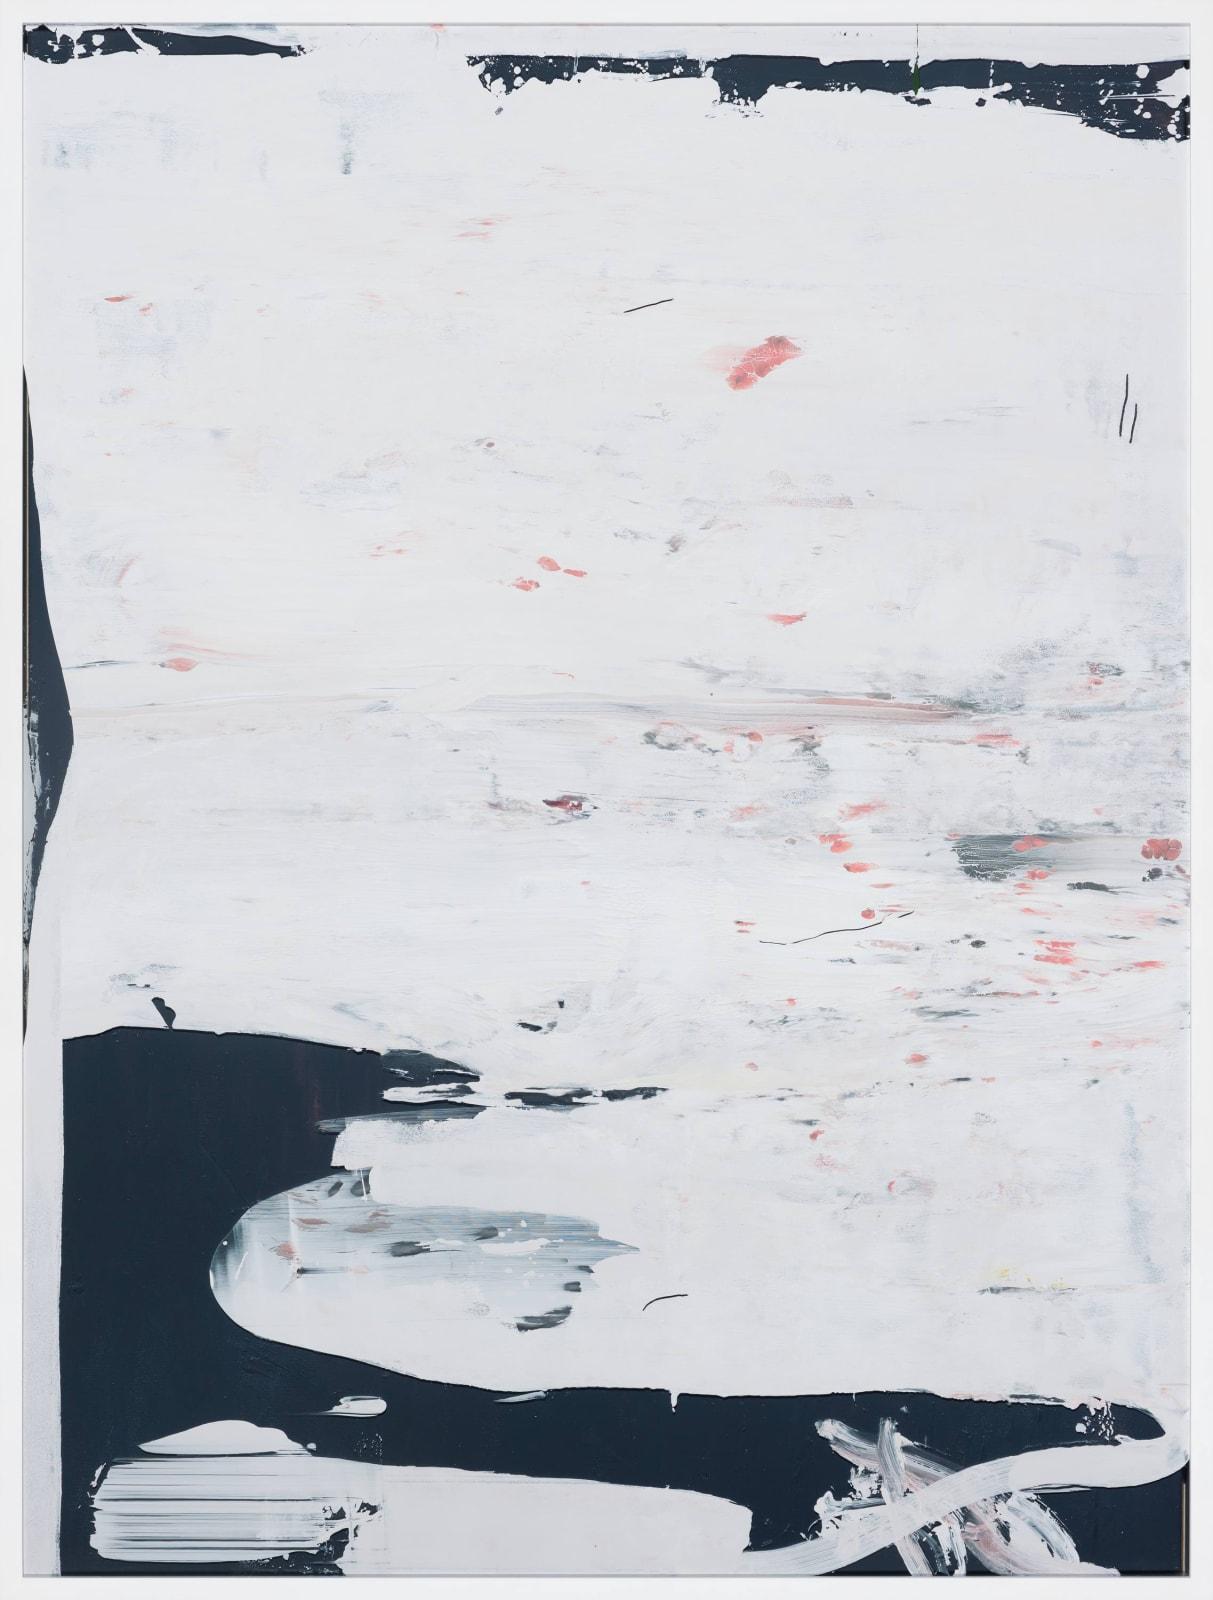 Shimokita-hantō, 2018/2019 Acrylic, gesso and lacquer on glass 165.5 x 125.8 x 6 cm | 65 1/4 x 49 1/2 x 2 1/3 in